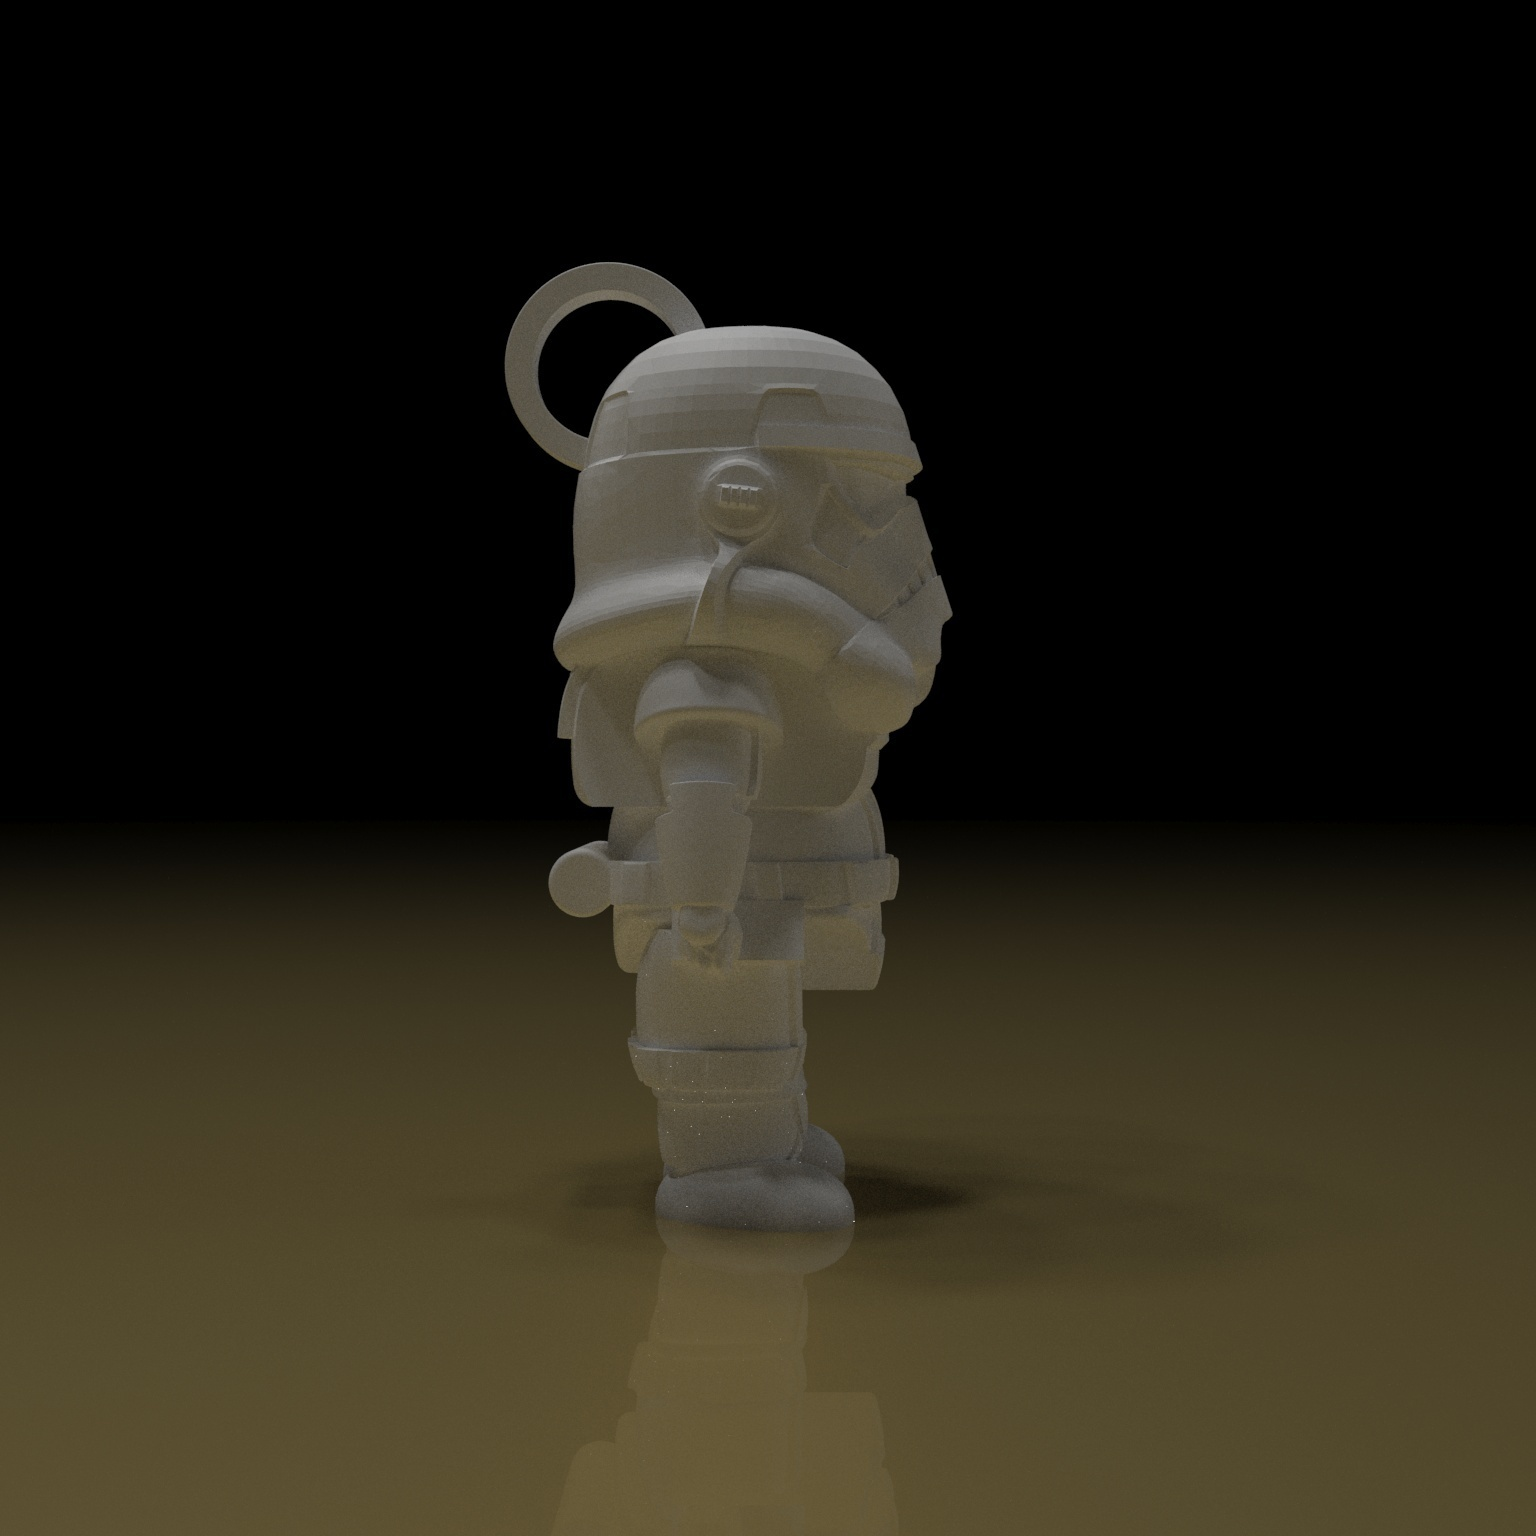 3.jpg Download free STL file STORMTROOPER KEY CHAIN • 3D printing template, paltony22